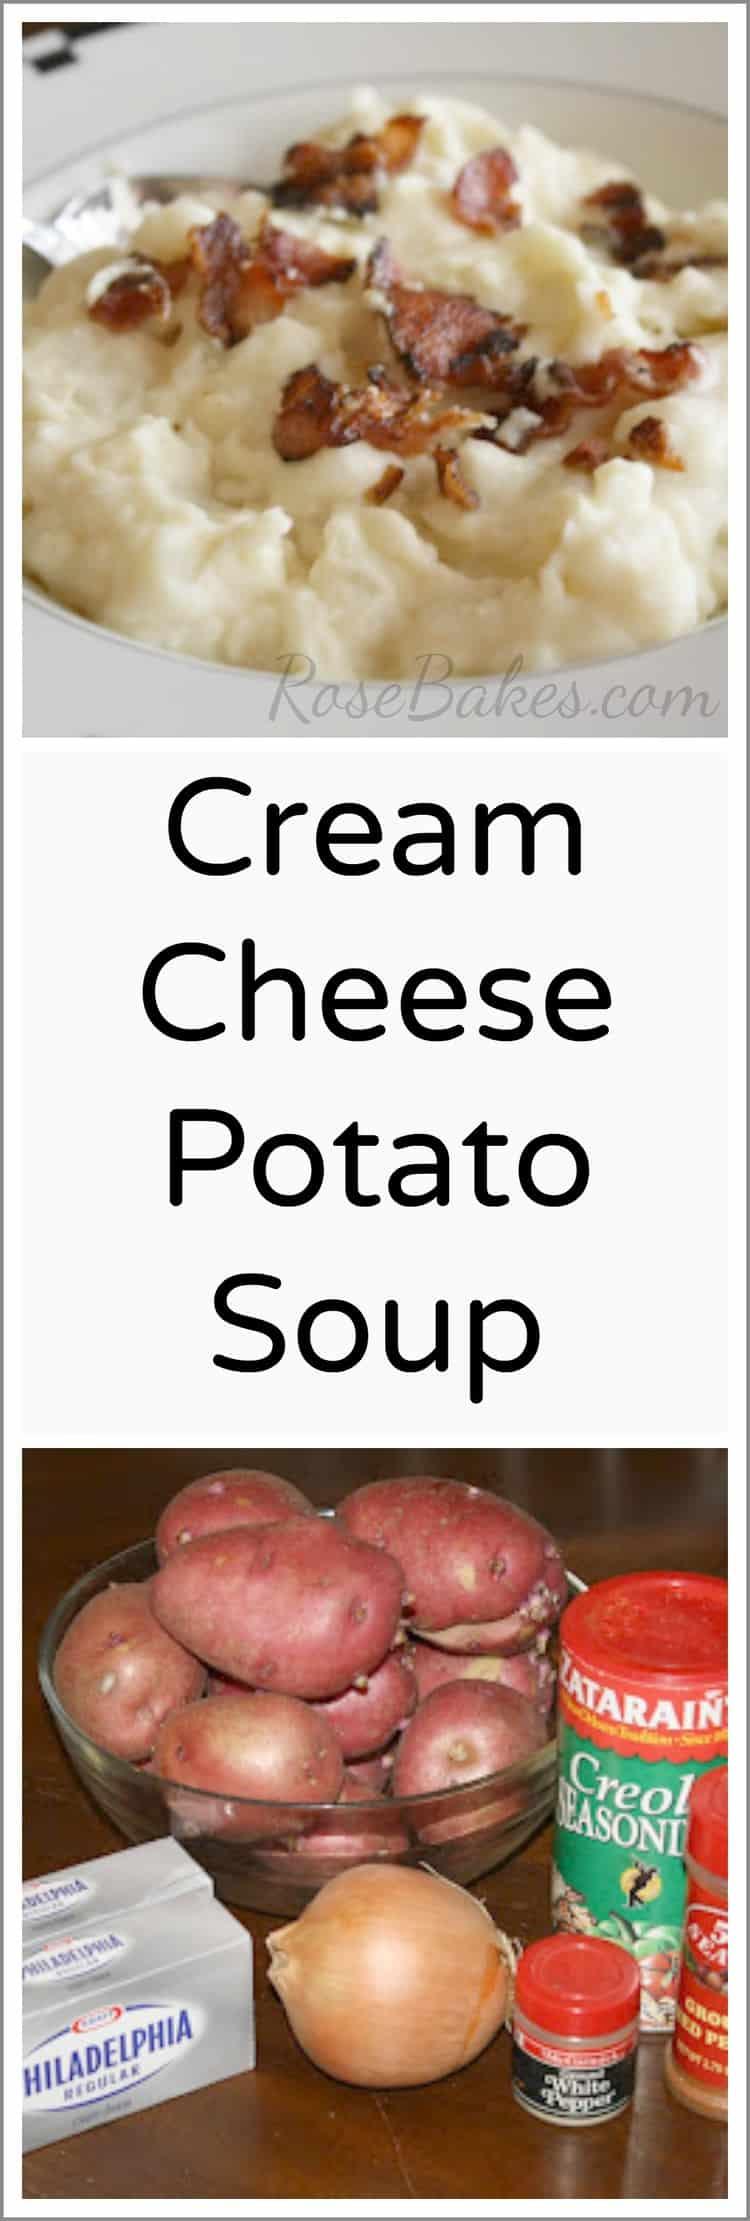 Cream Cheese Potato Soup Recipe from Rose Bakes